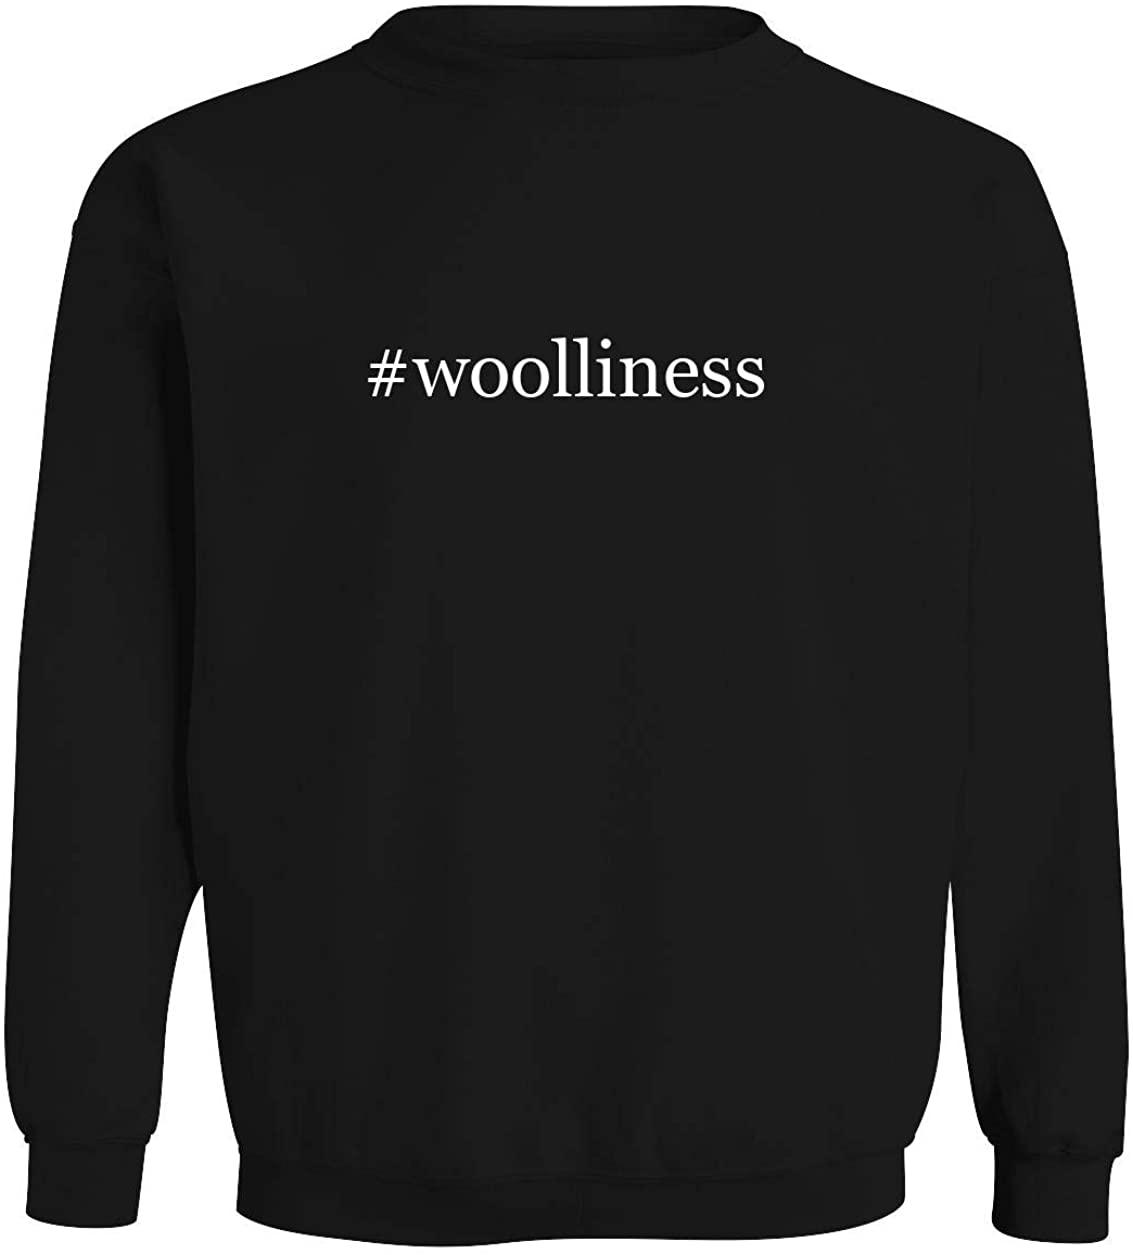 #woolliness - Men's Hashtag Soft & Comfortable Long Sleeve T-Shirt